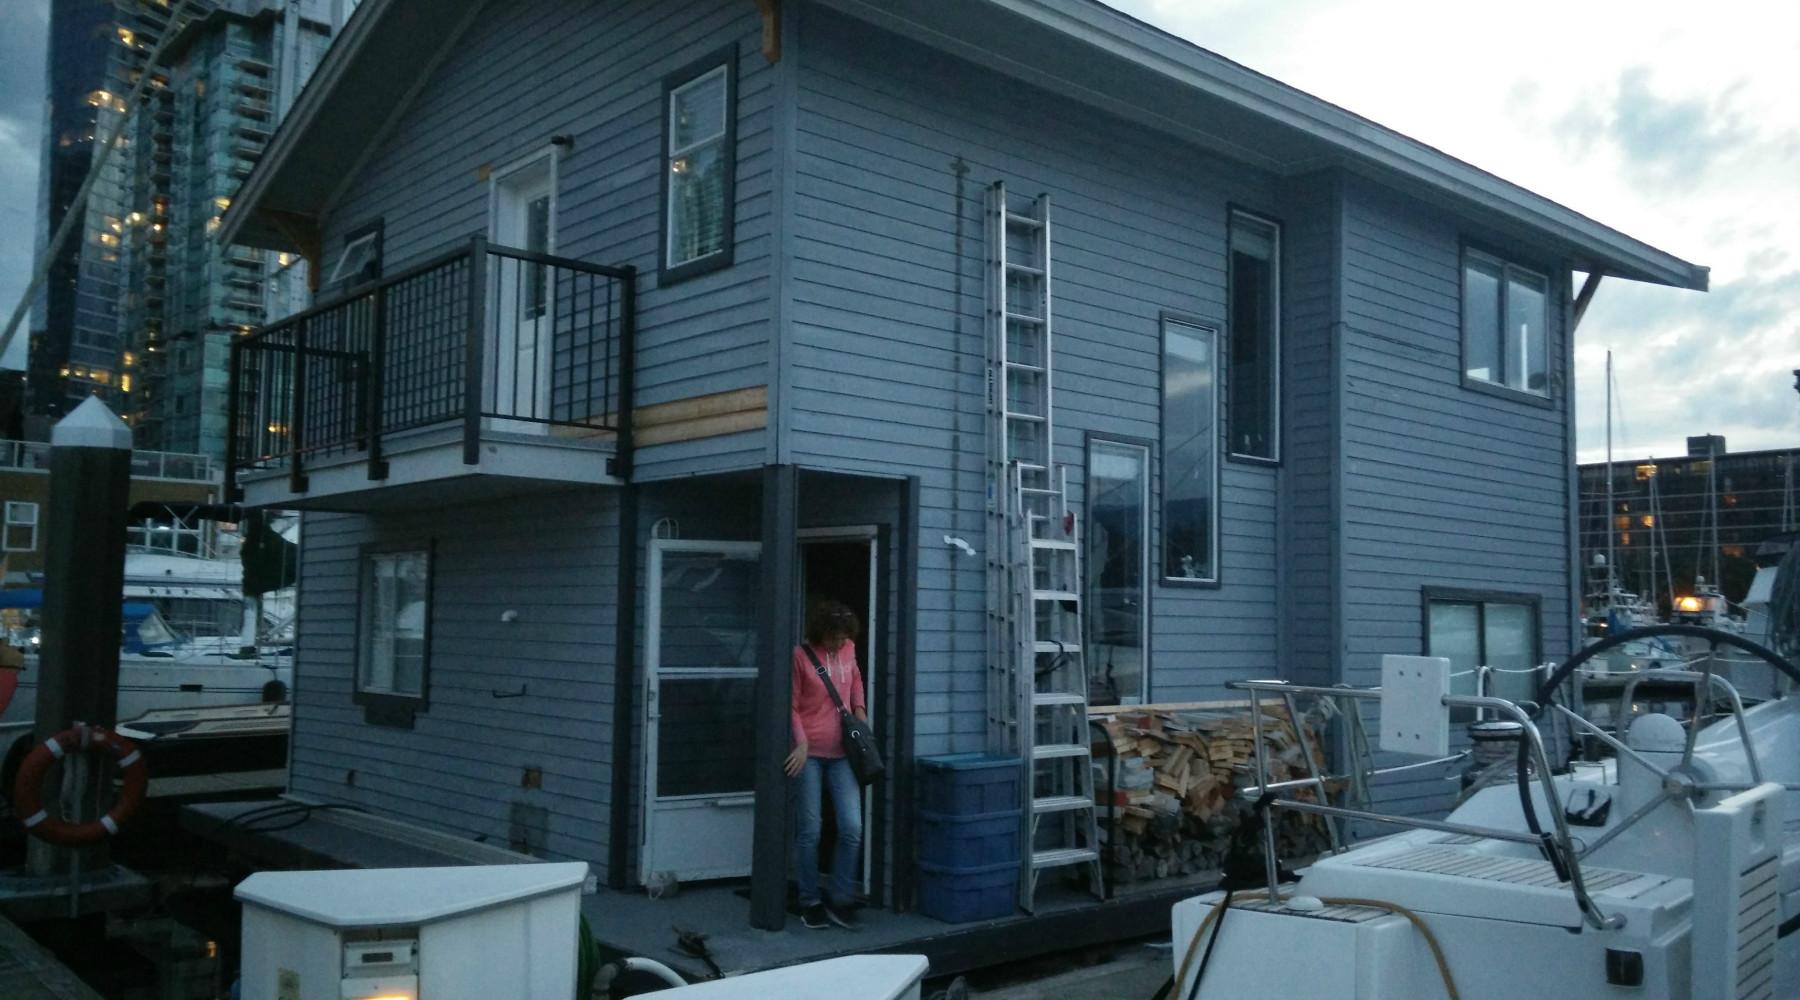 bernachten im boathouse und jobsuche in kelowna my life experience. Black Bedroom Furniture Sets. Home Design Ideas